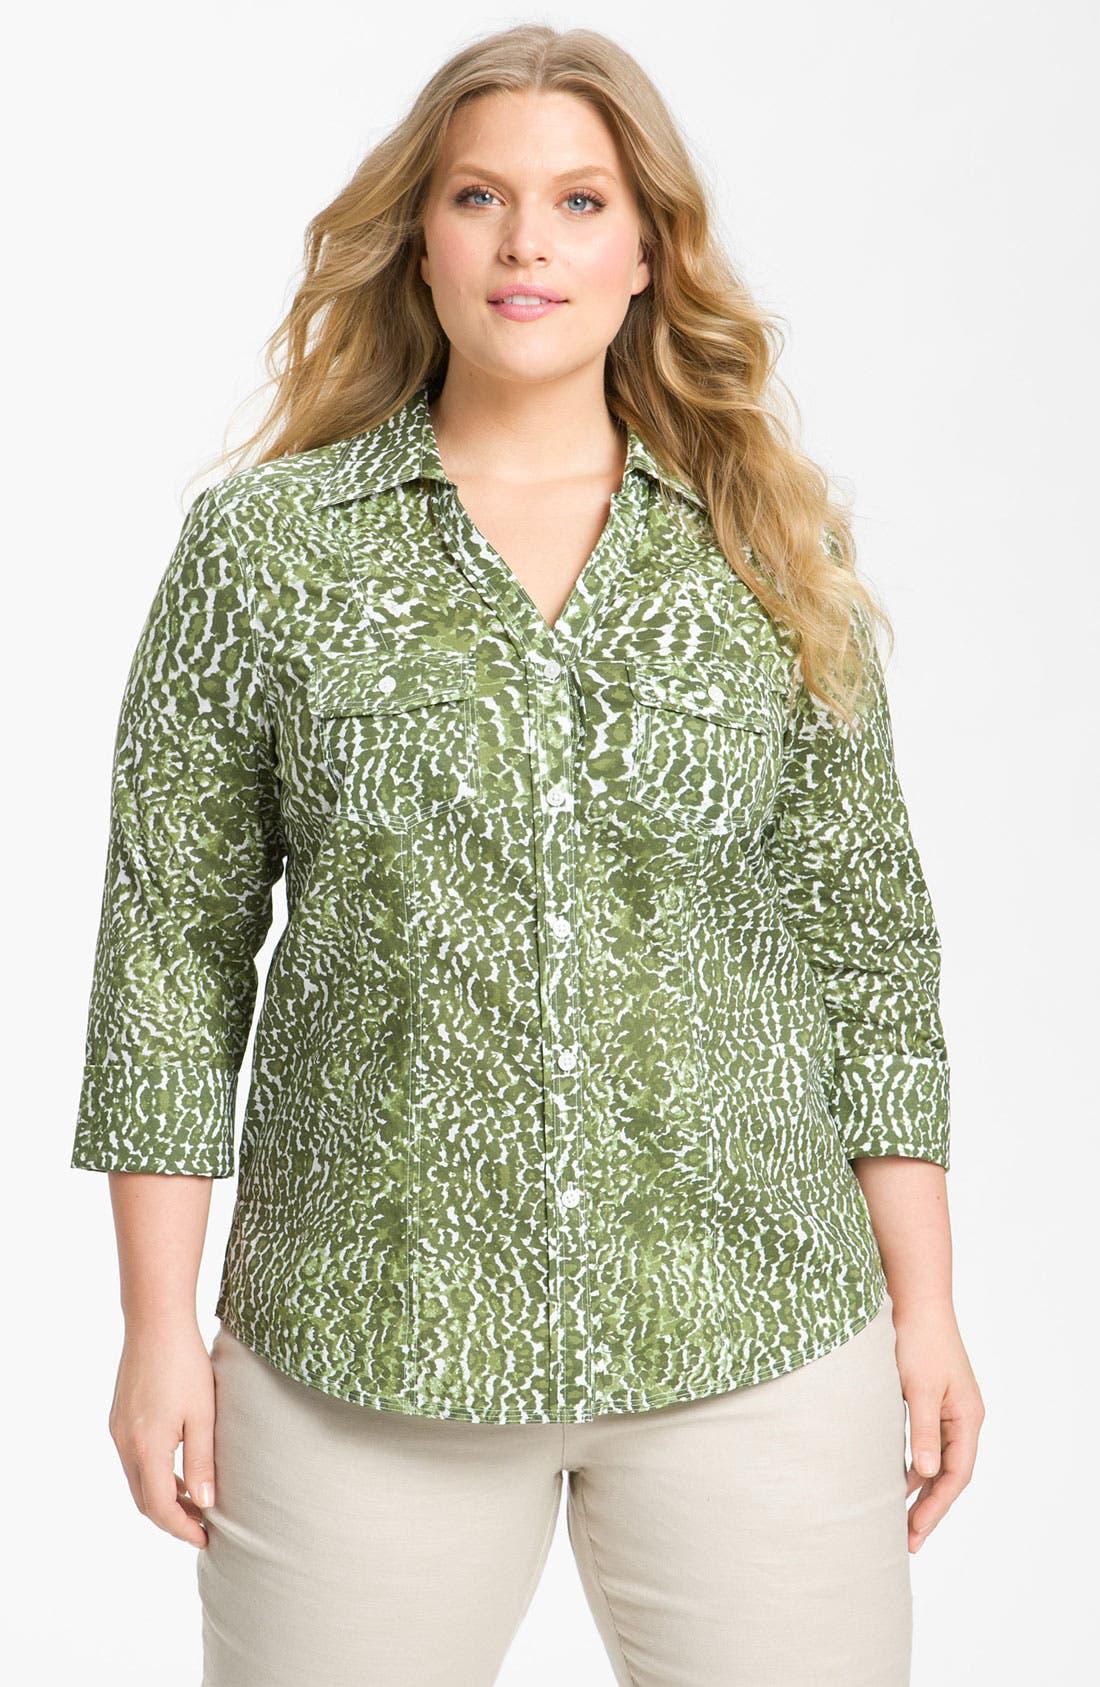 Main Image - Foxcroft Leopard Print Shaped Shirt (Plus)